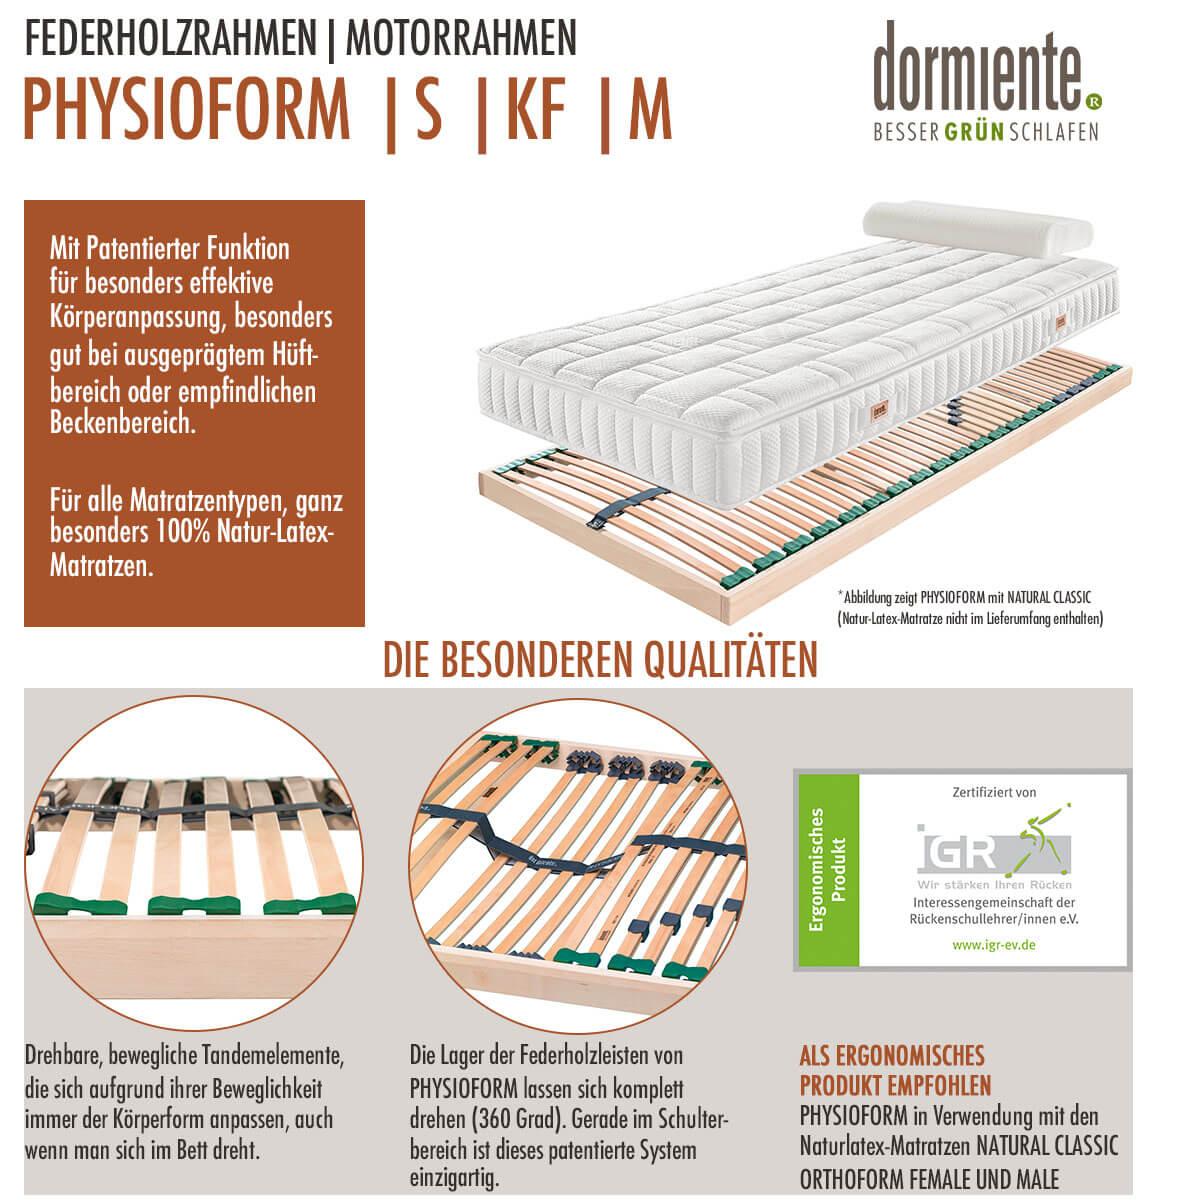 Dormiente-Physioform-Federholzrahmen-Motorrahmen-online-bestellen